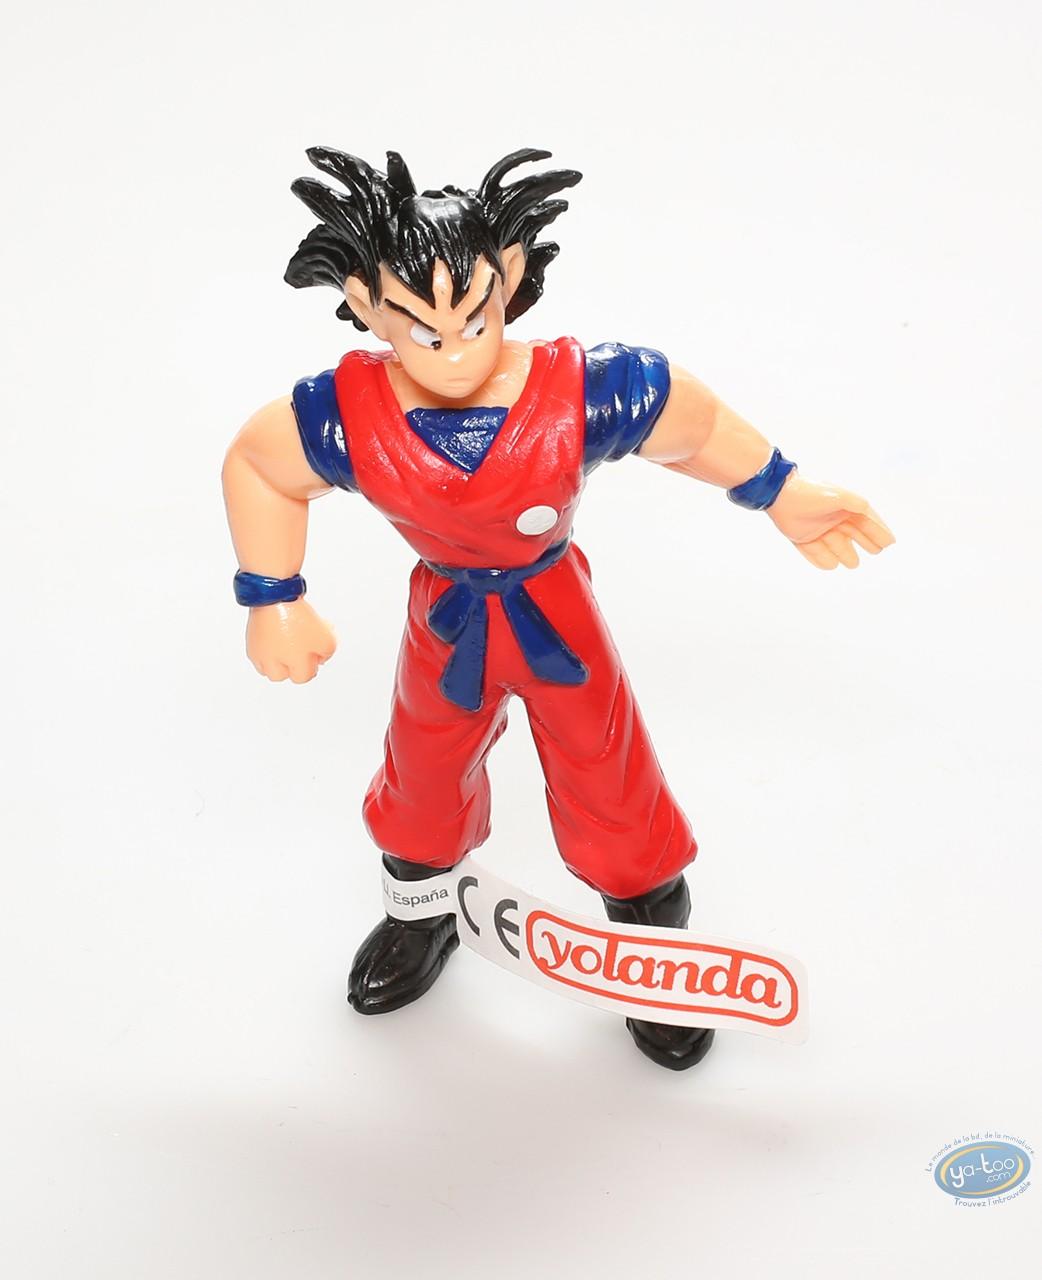 Plastic Figurine, Dragon Ball Z : Son Gokž black hair